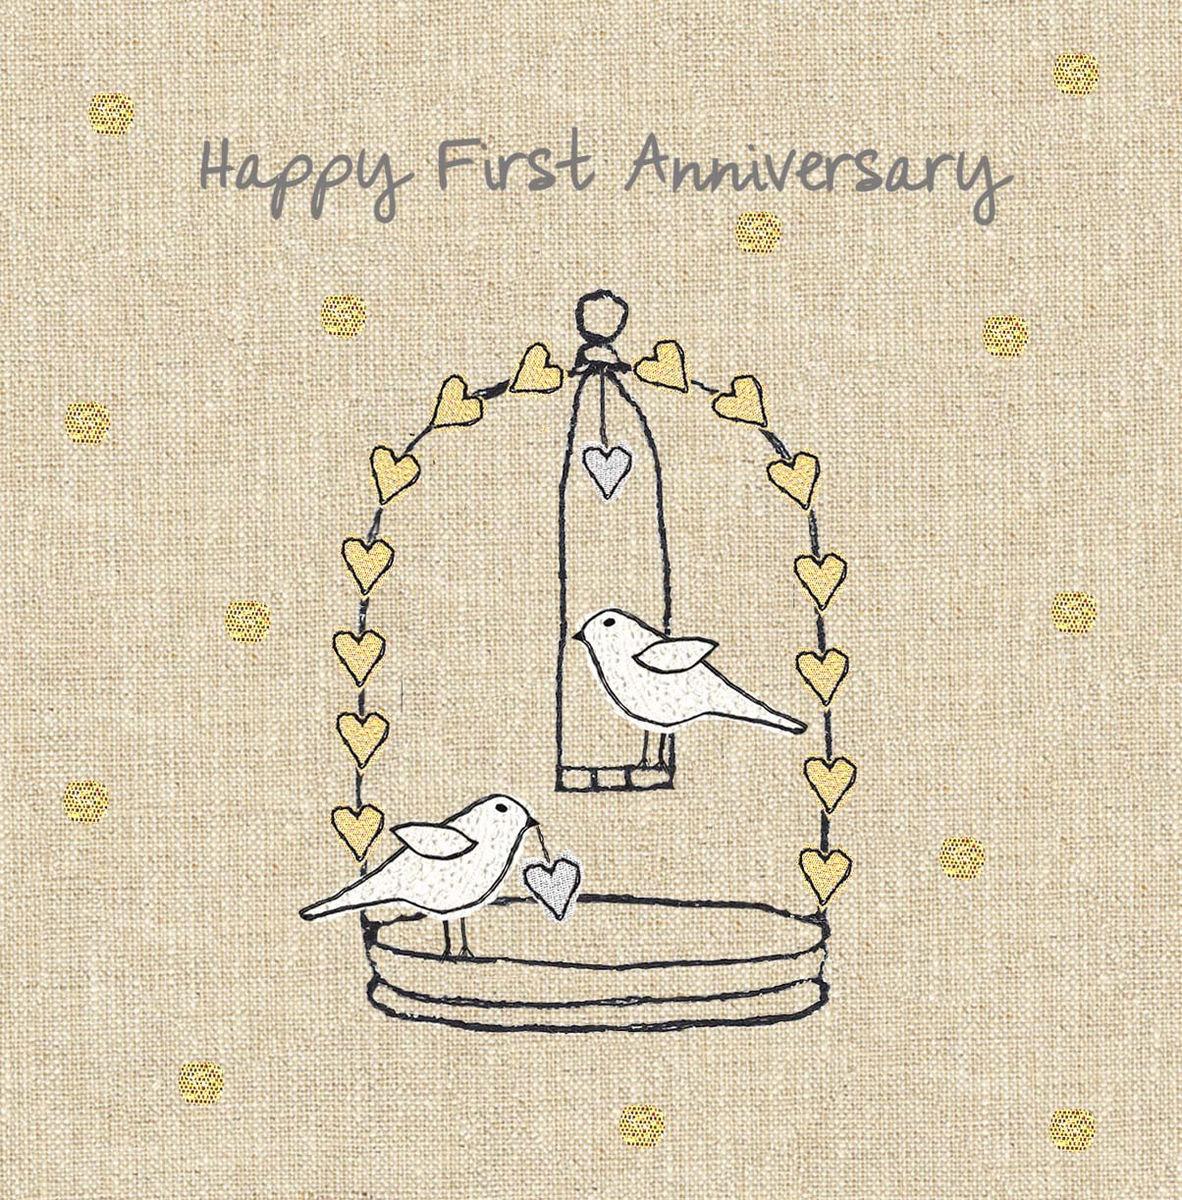 Anniversary Birds First Wedding Anniversary Card Karenza Paperie